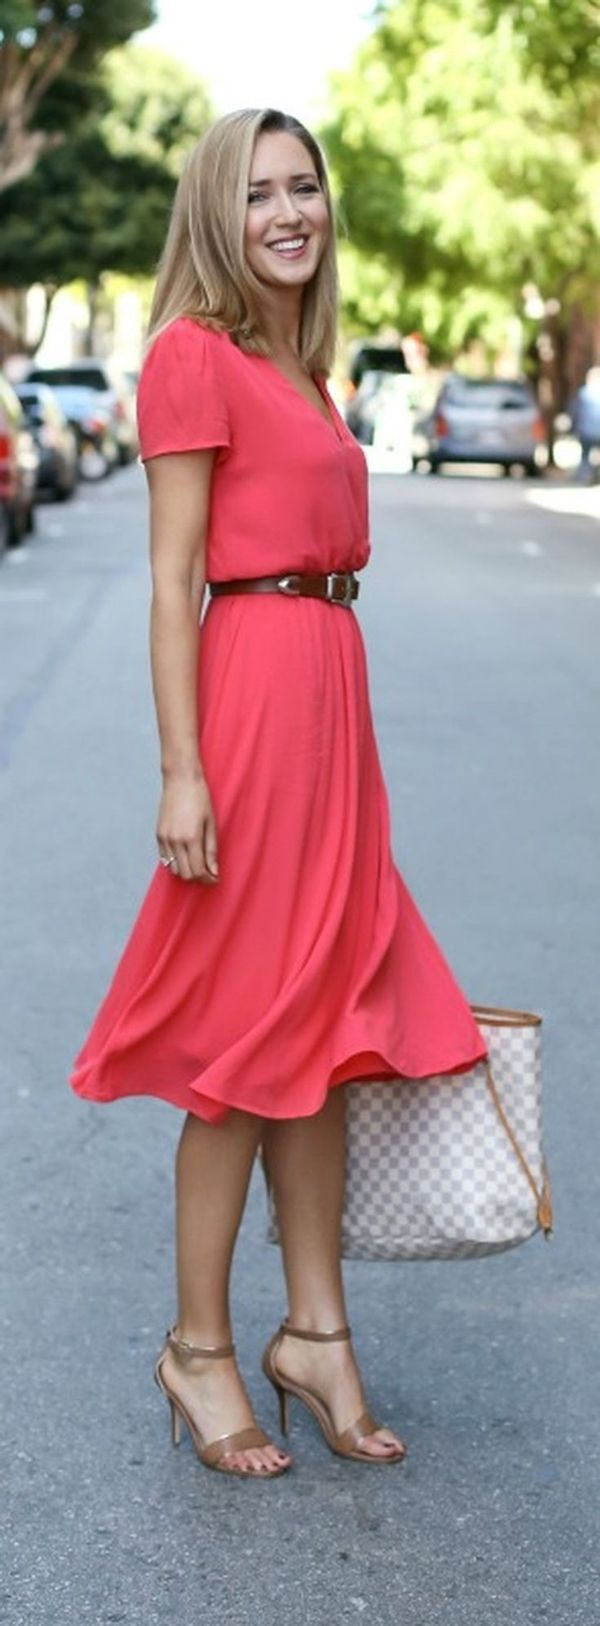 Komplette Outfits Frauen